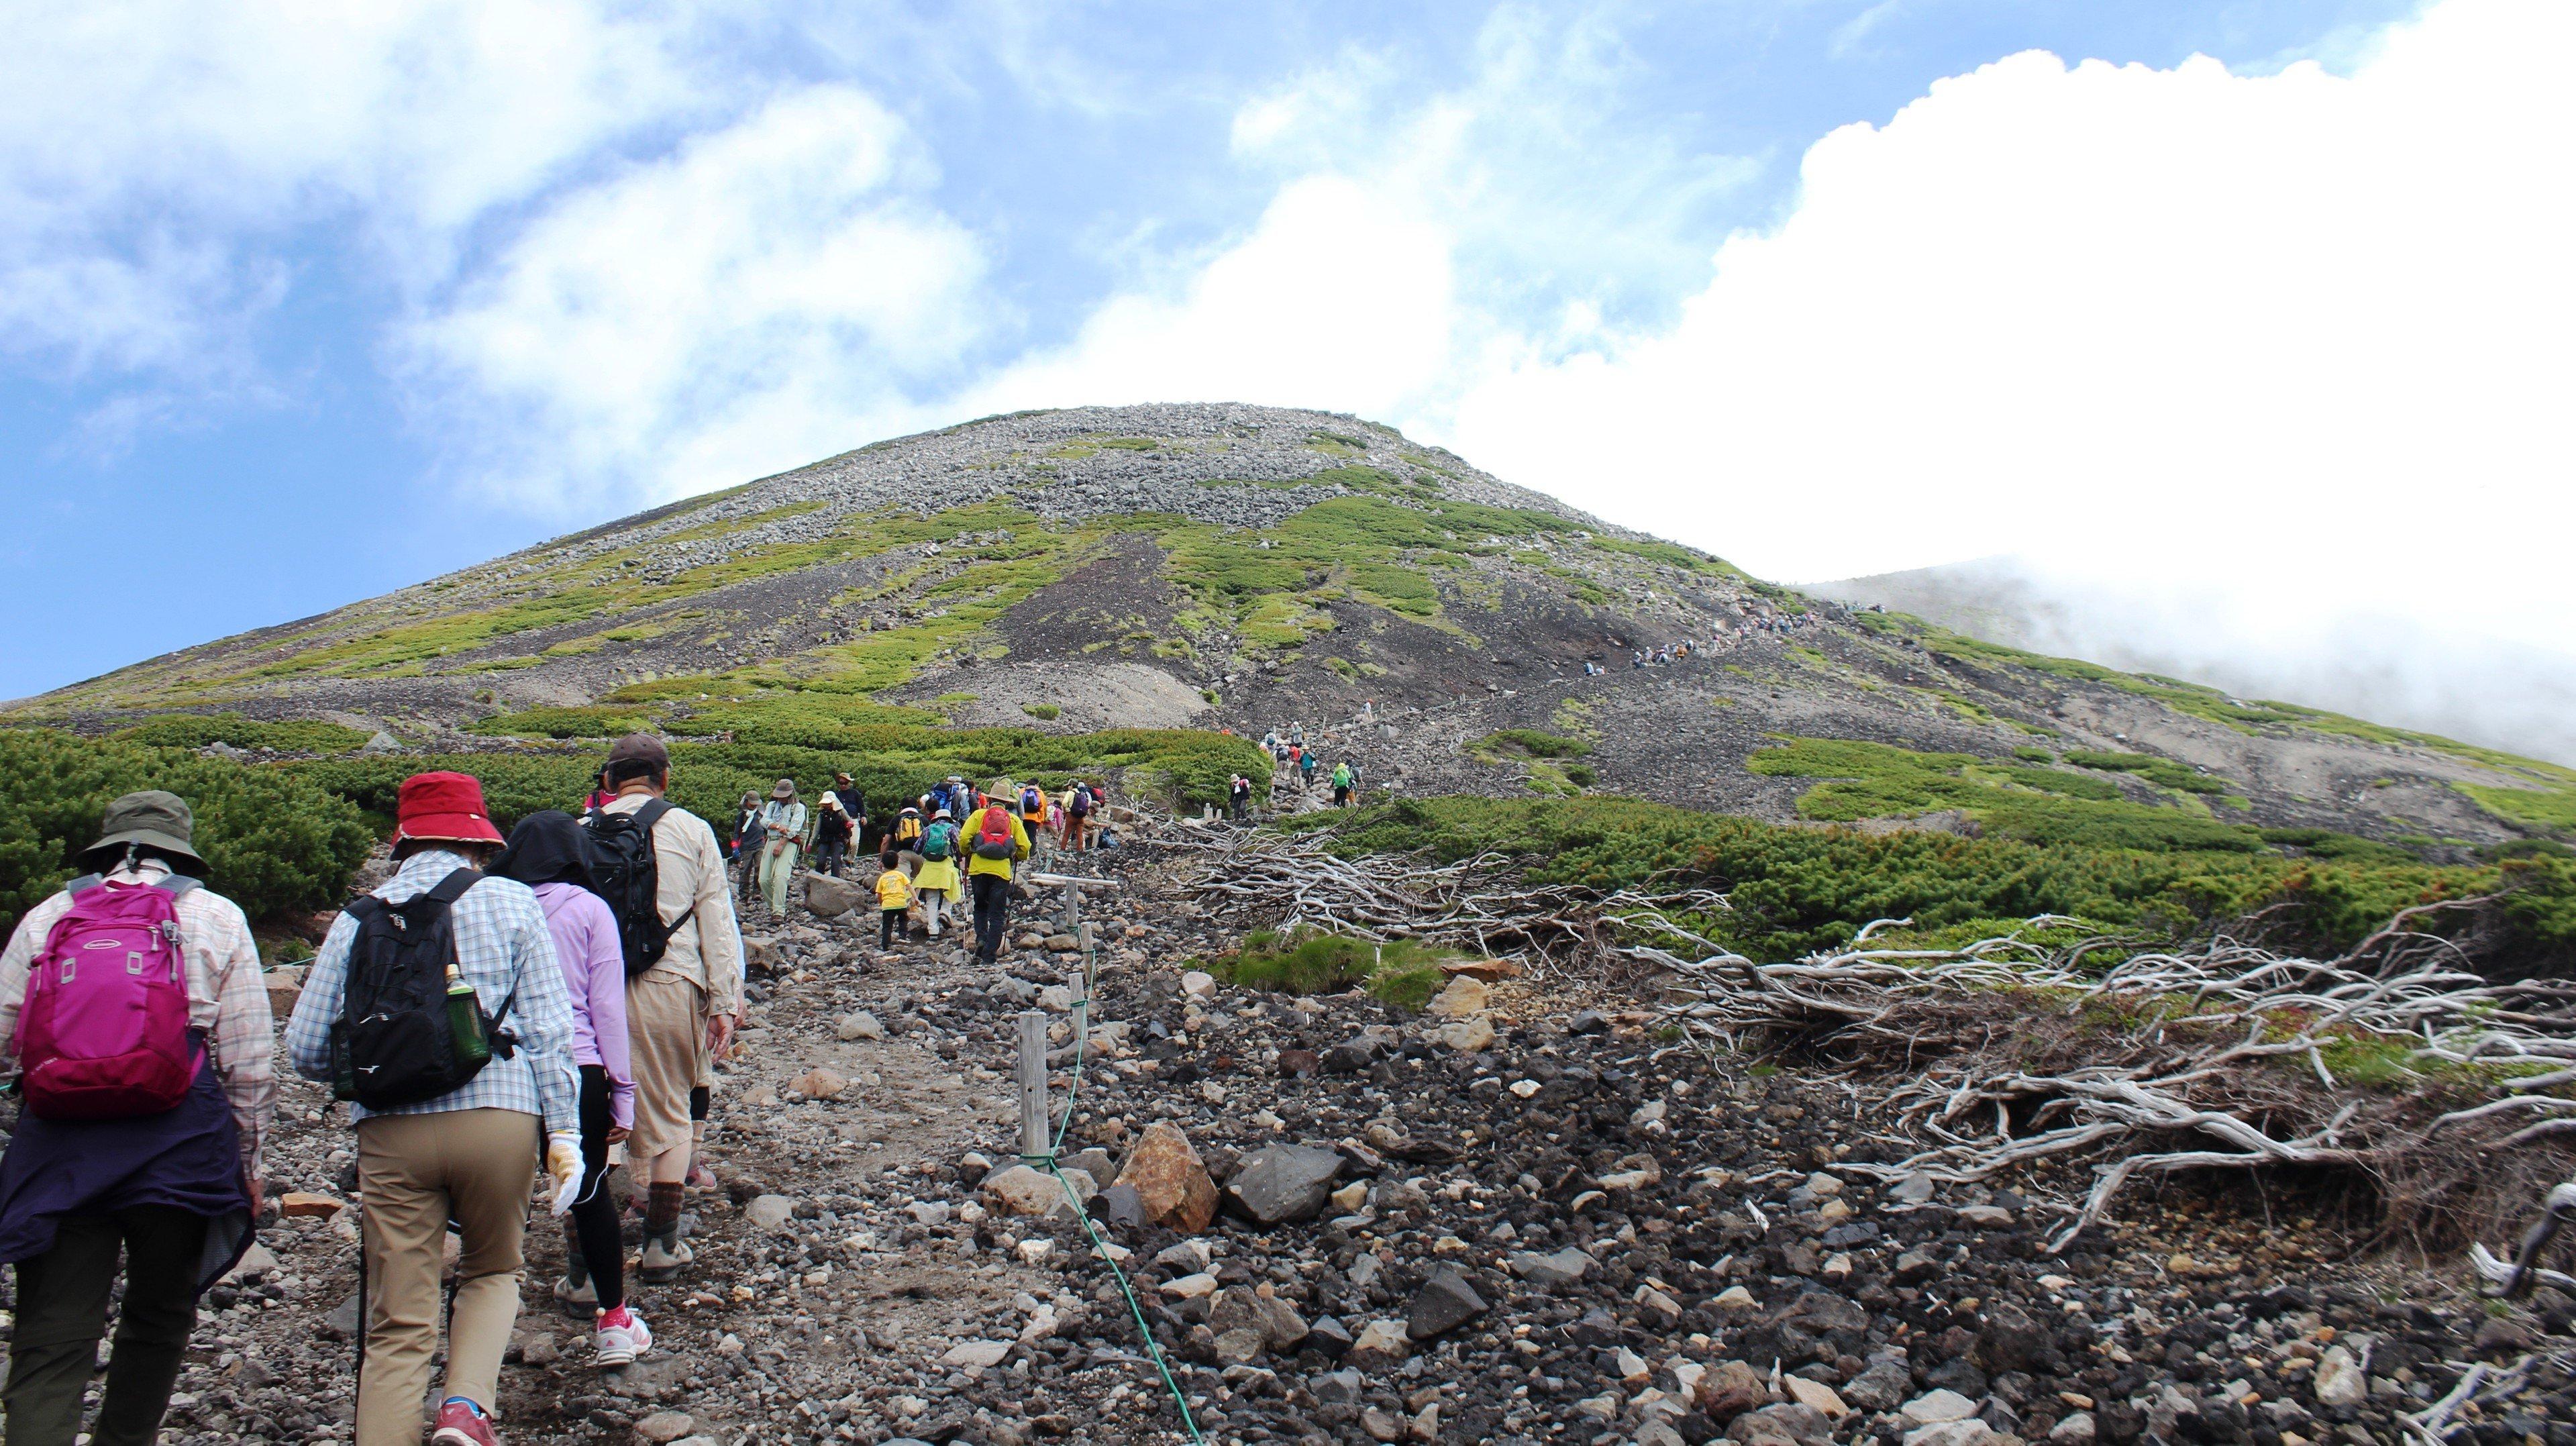 Hiking_for_Mount_Norikura.jpg